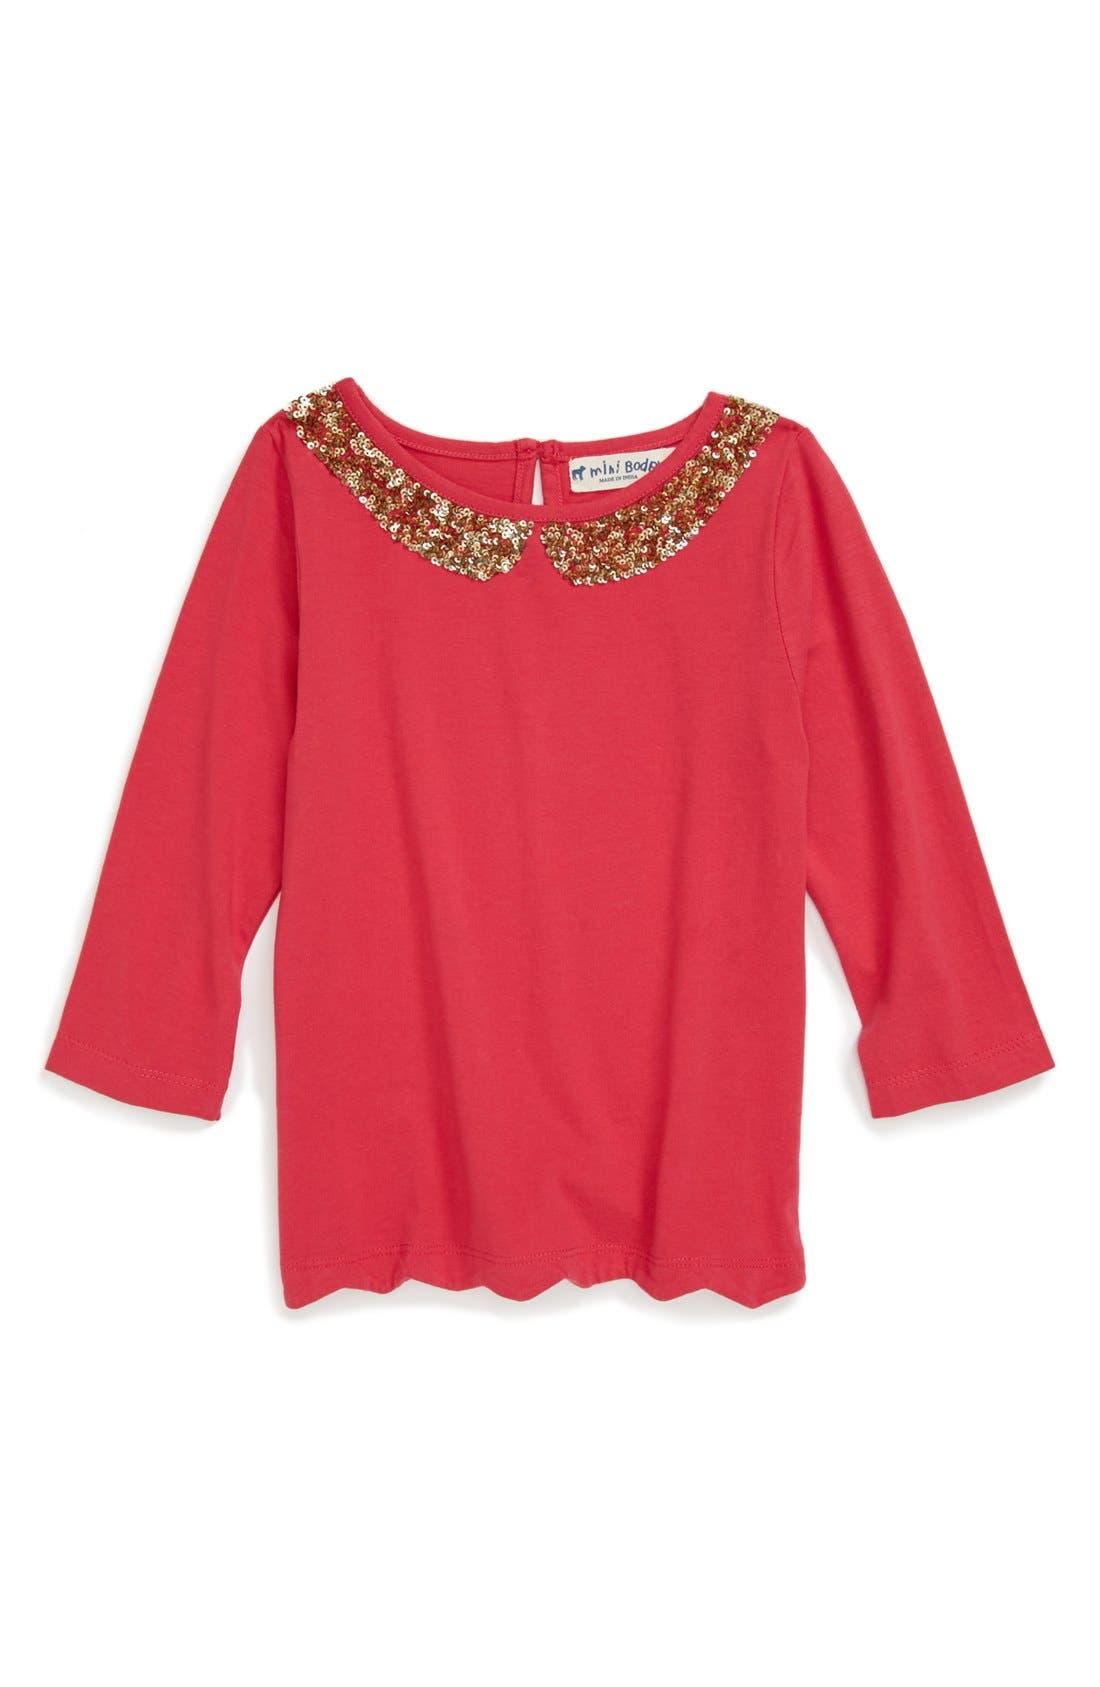 Main Image - Mini Boden 'Sequin Collar' Tee (Little Girls & Big Girls)